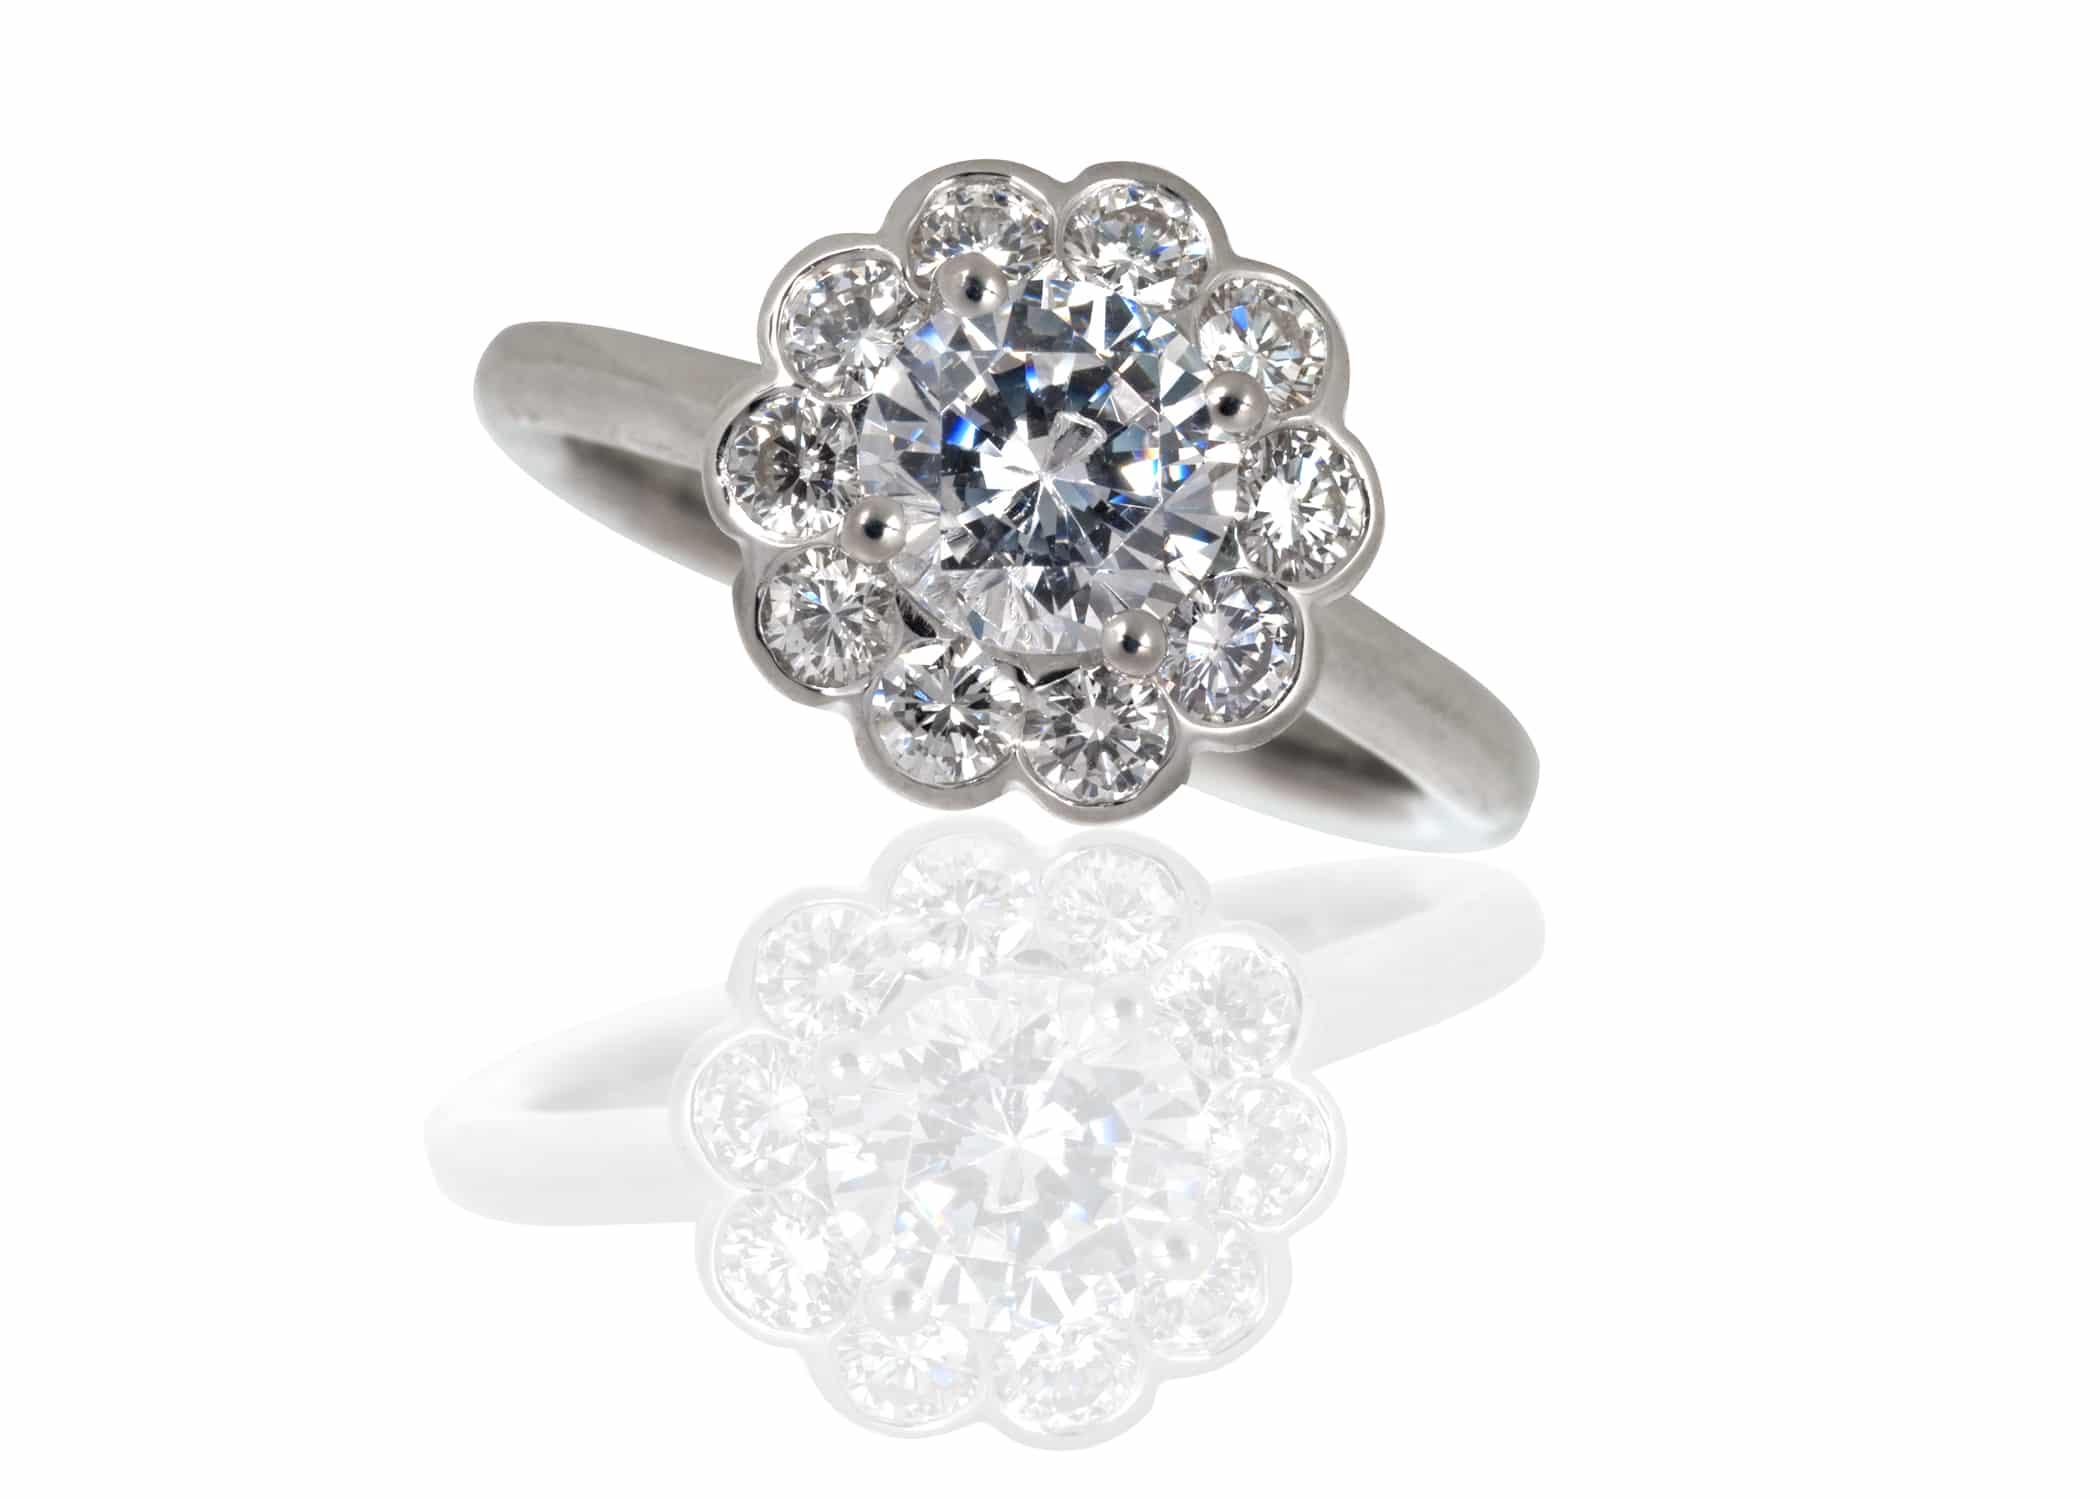 Reset Remount Diamond Engagement Ring Boston Keezing Kreations